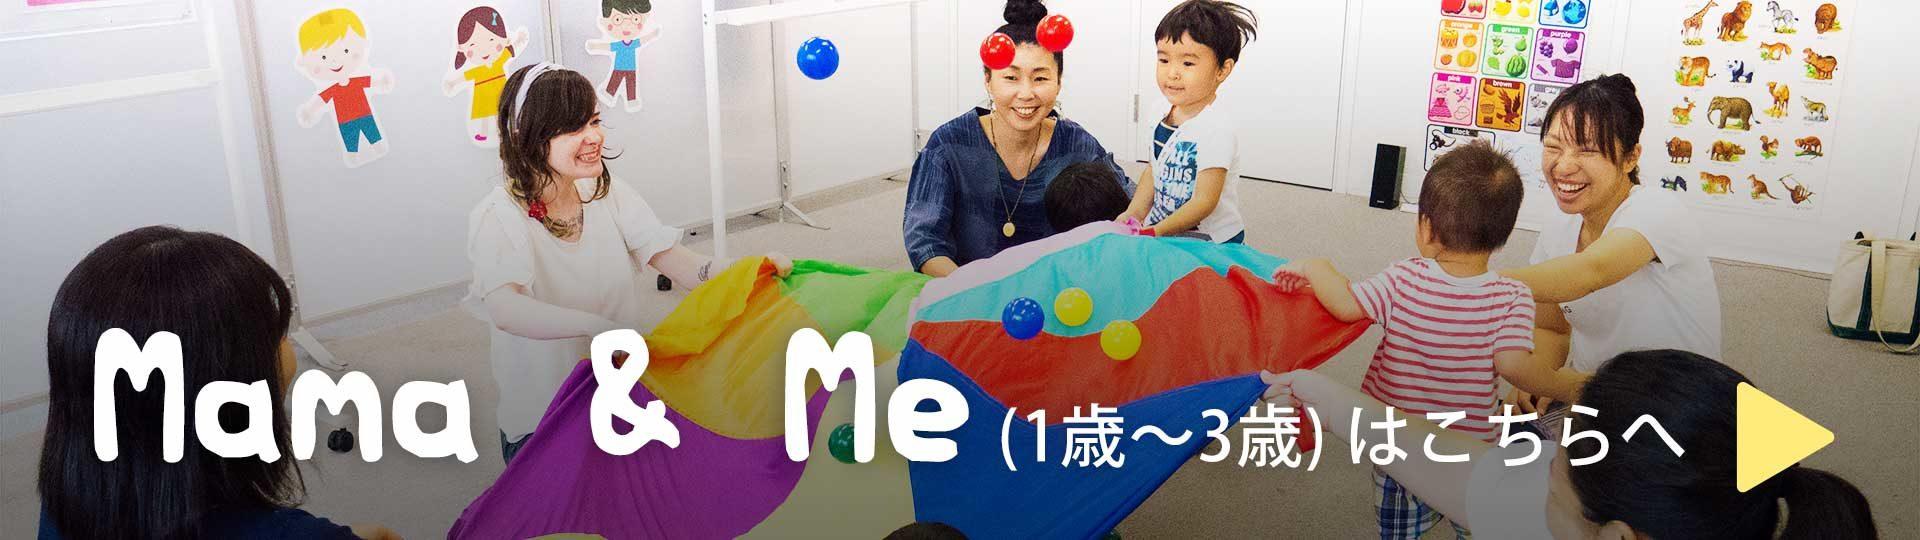 mama & me 親子教室